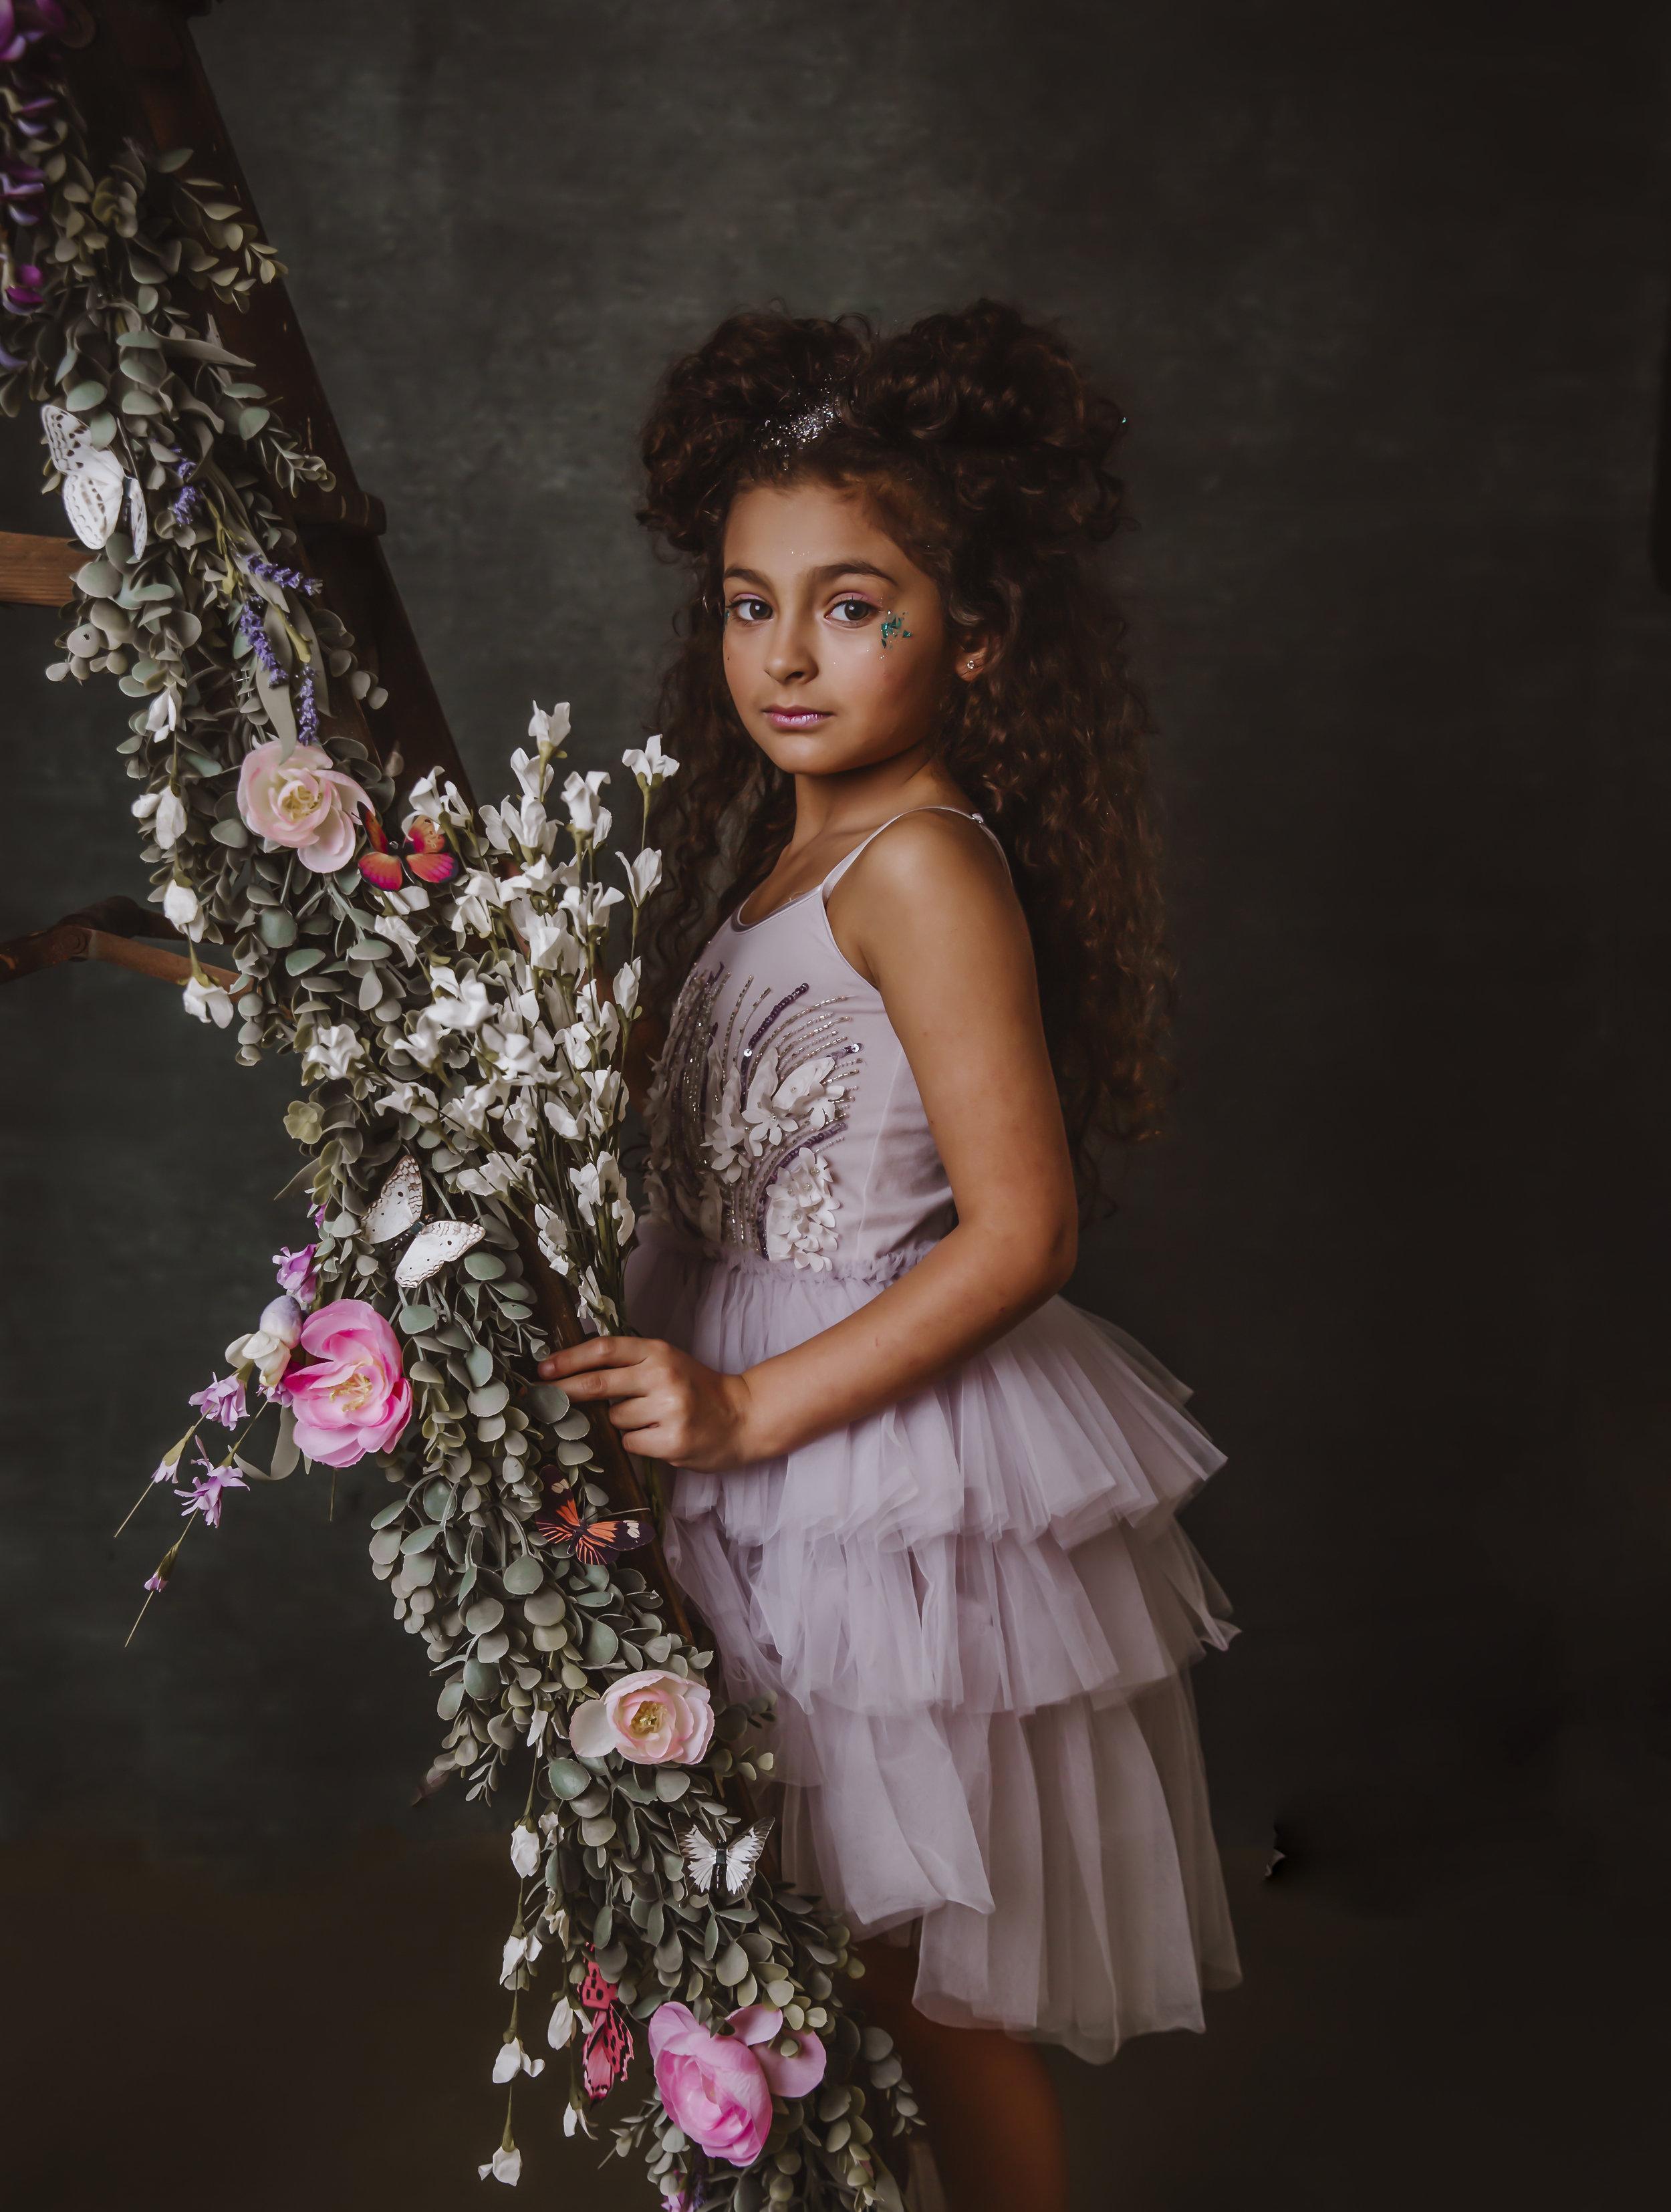 Fine Art Child Sugar Land Photographer